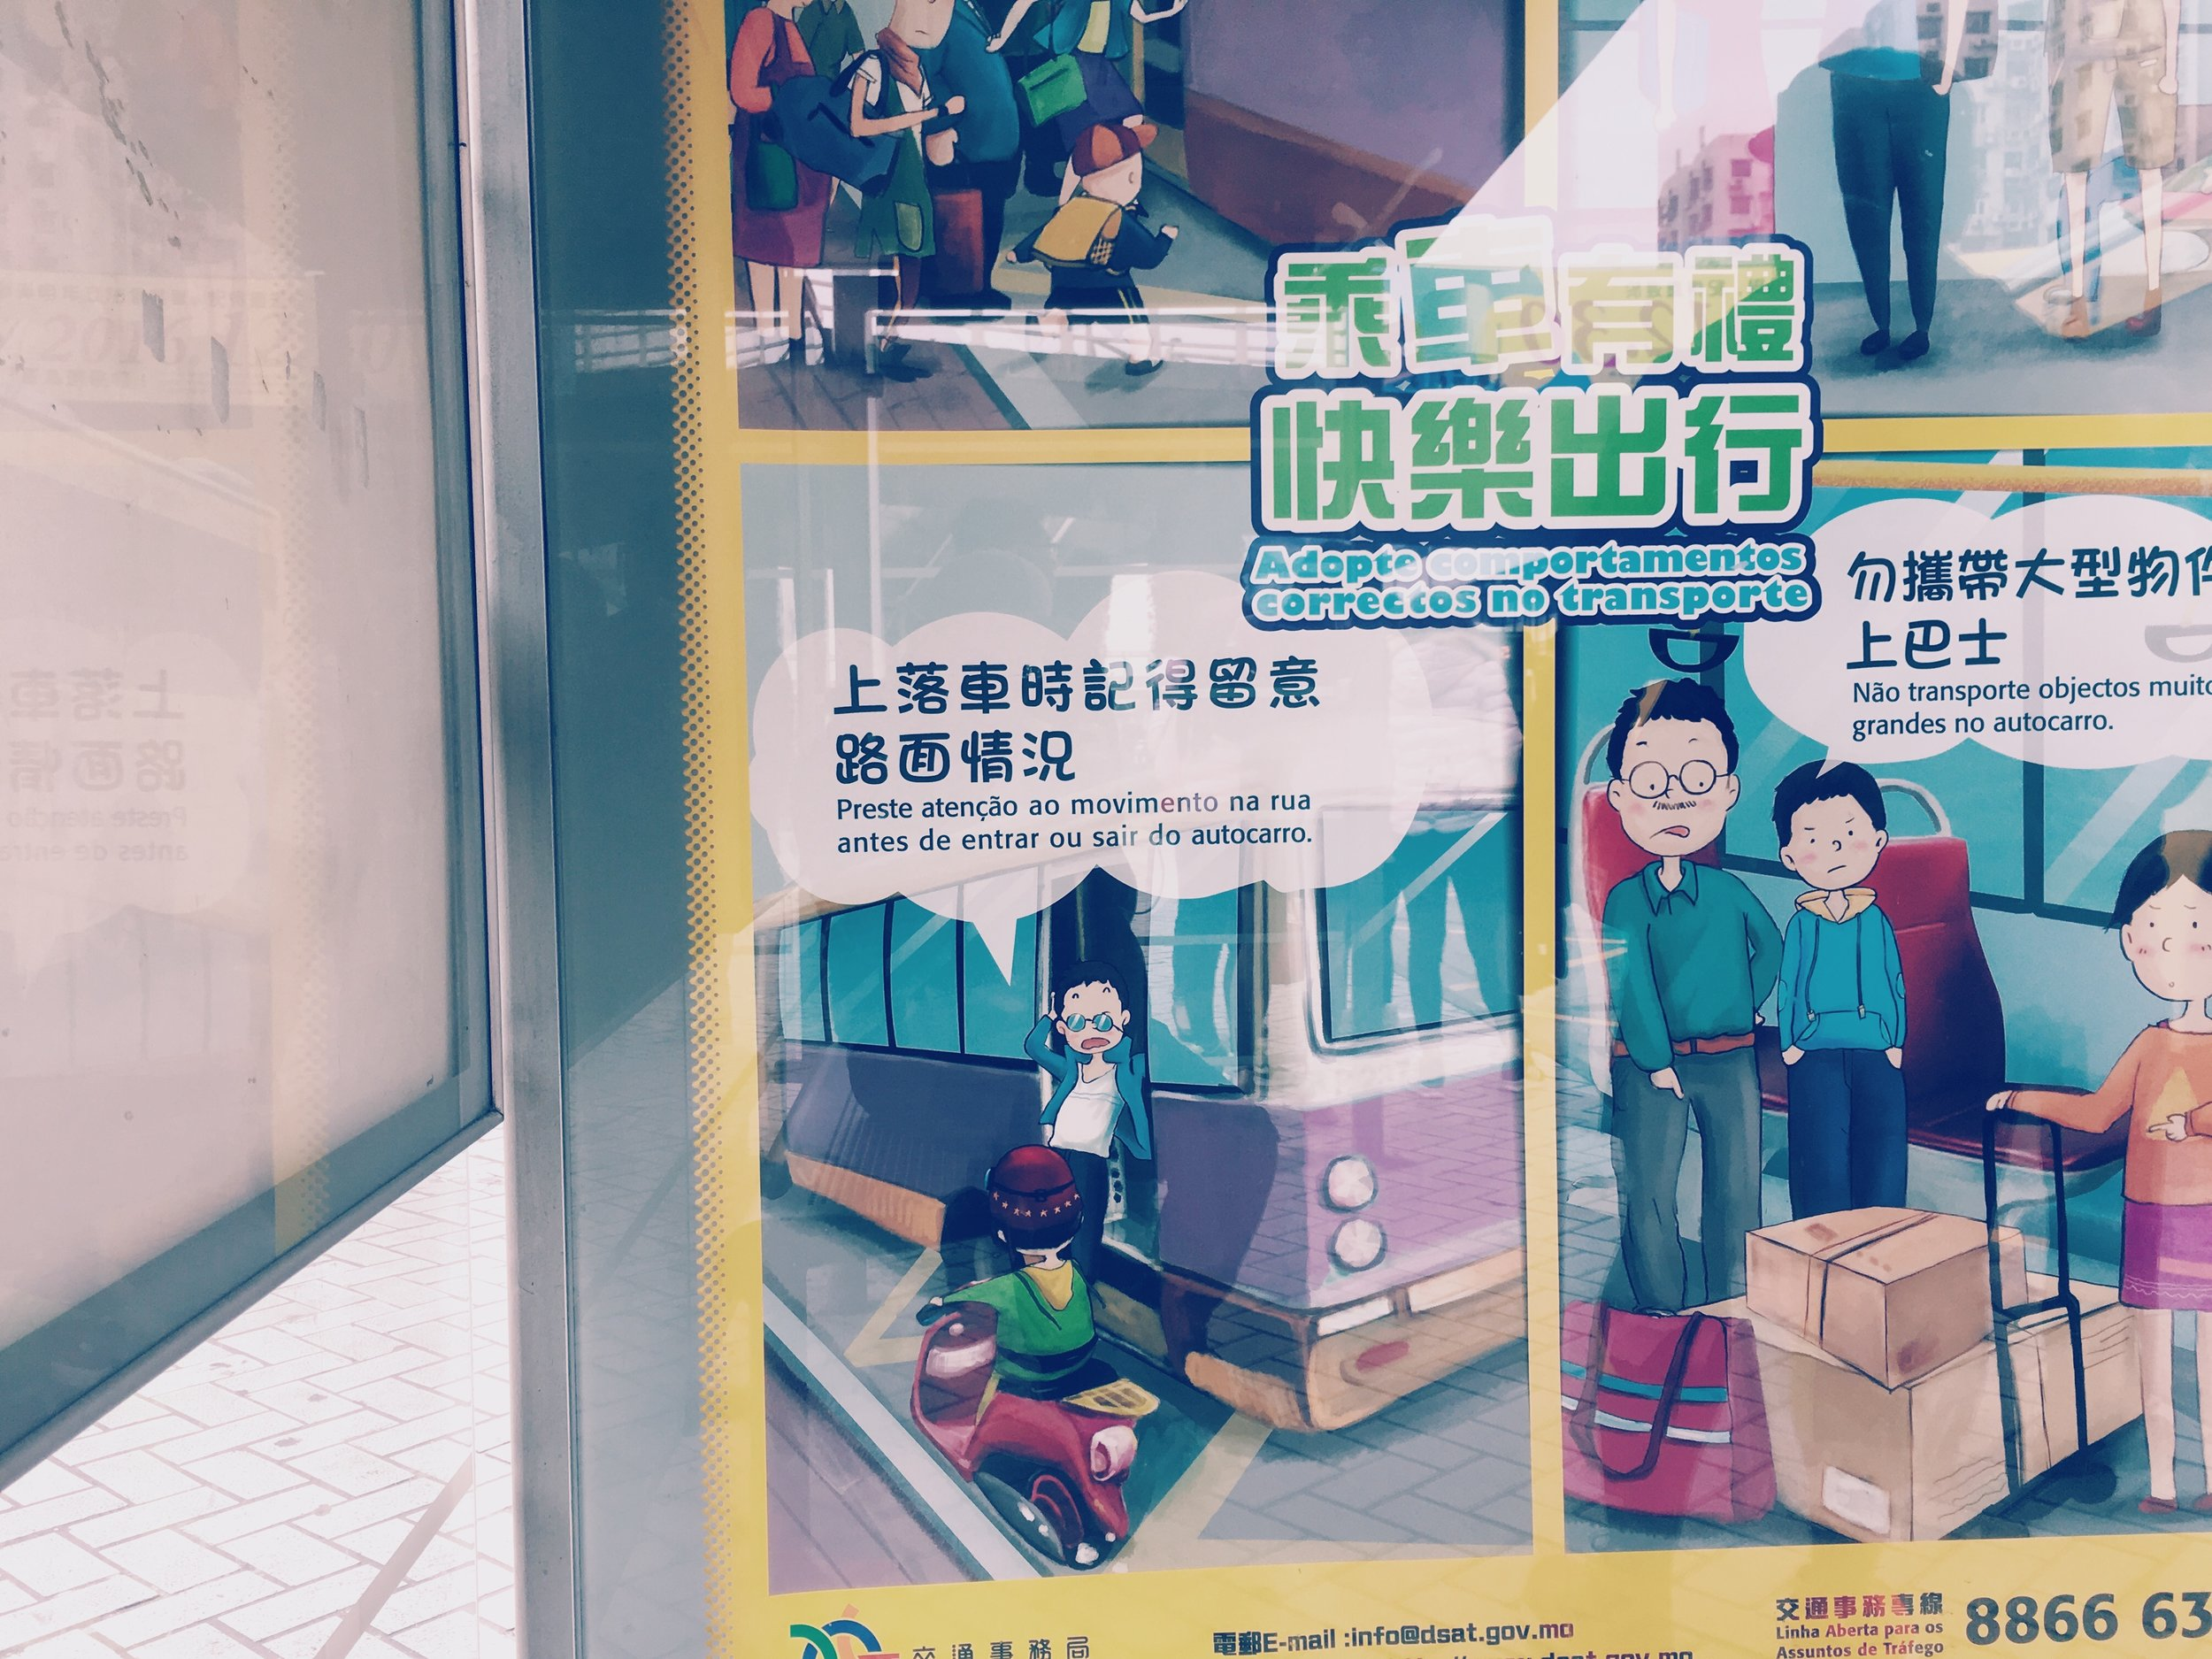 Public Bus Stops in Macau